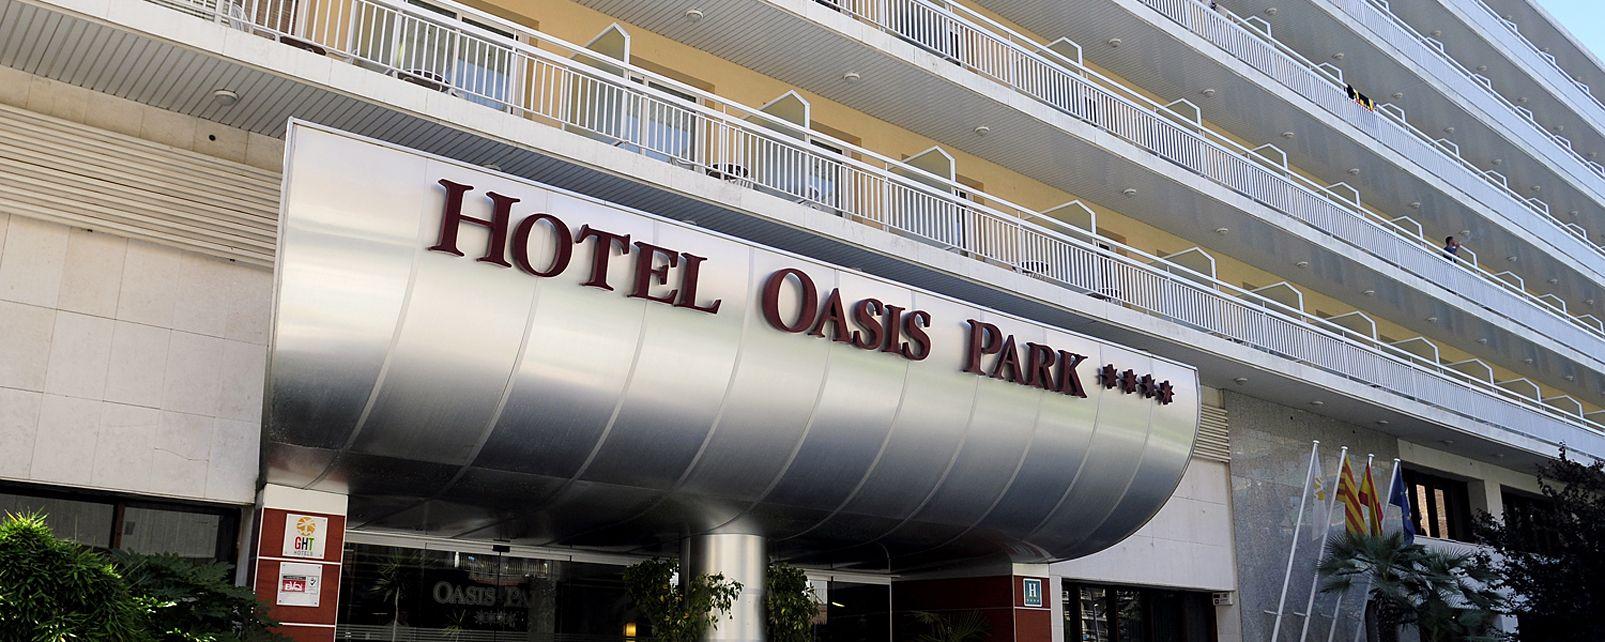 Hôtel Oasis Park